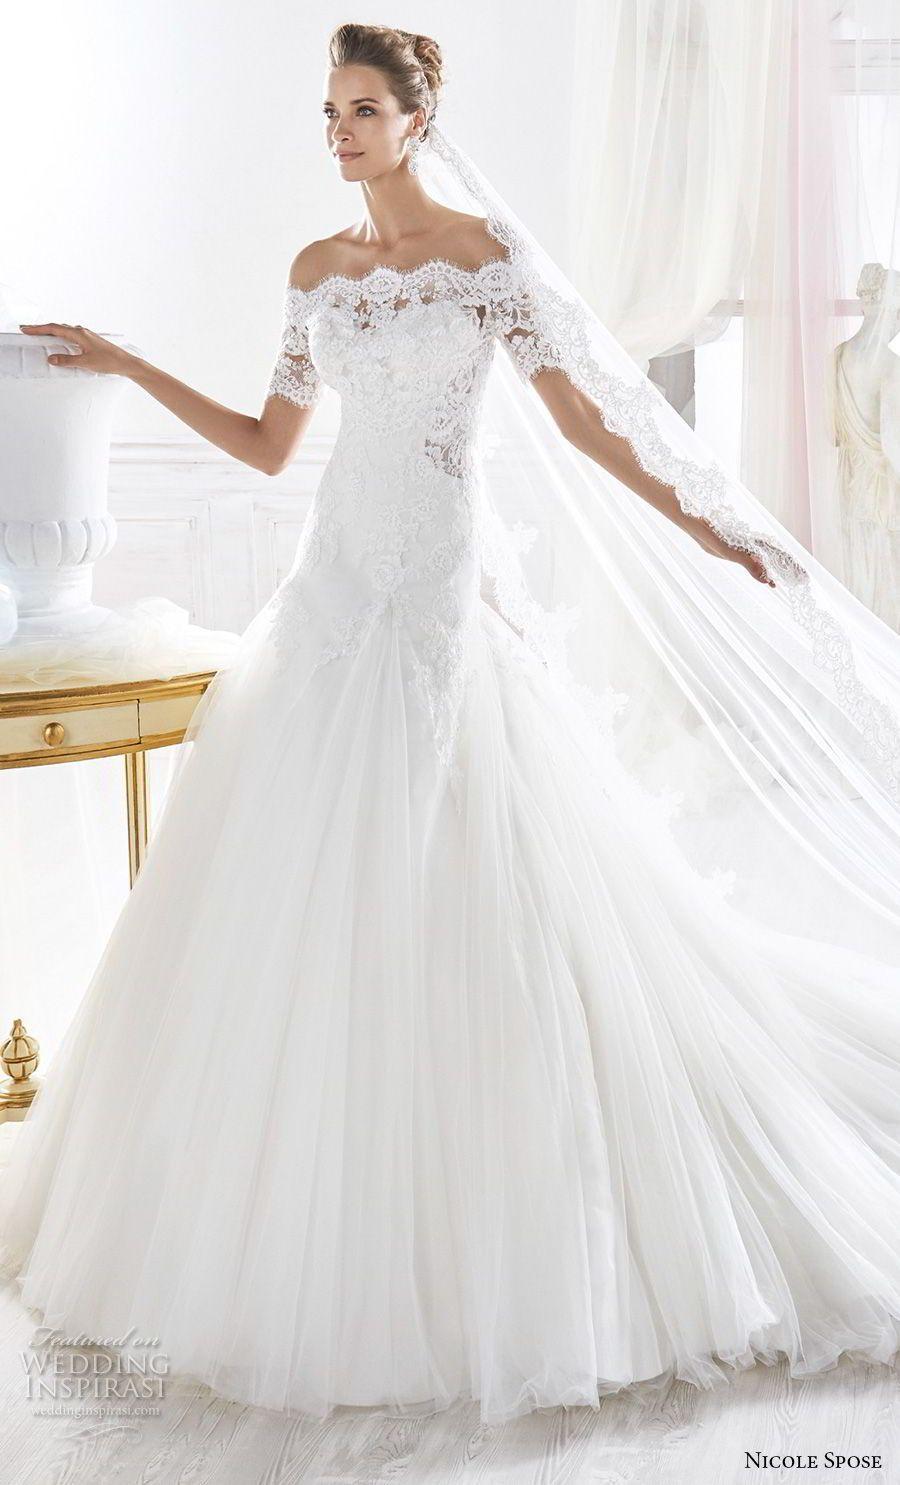 Nicole 2018 Bridal Collection Princess Ready Wedding Dresses Wedding Inspirasi Wedding Dresses Sheer Wedding Dress Wedding Dresses Lace [ 1485 x 900 Pixel ]